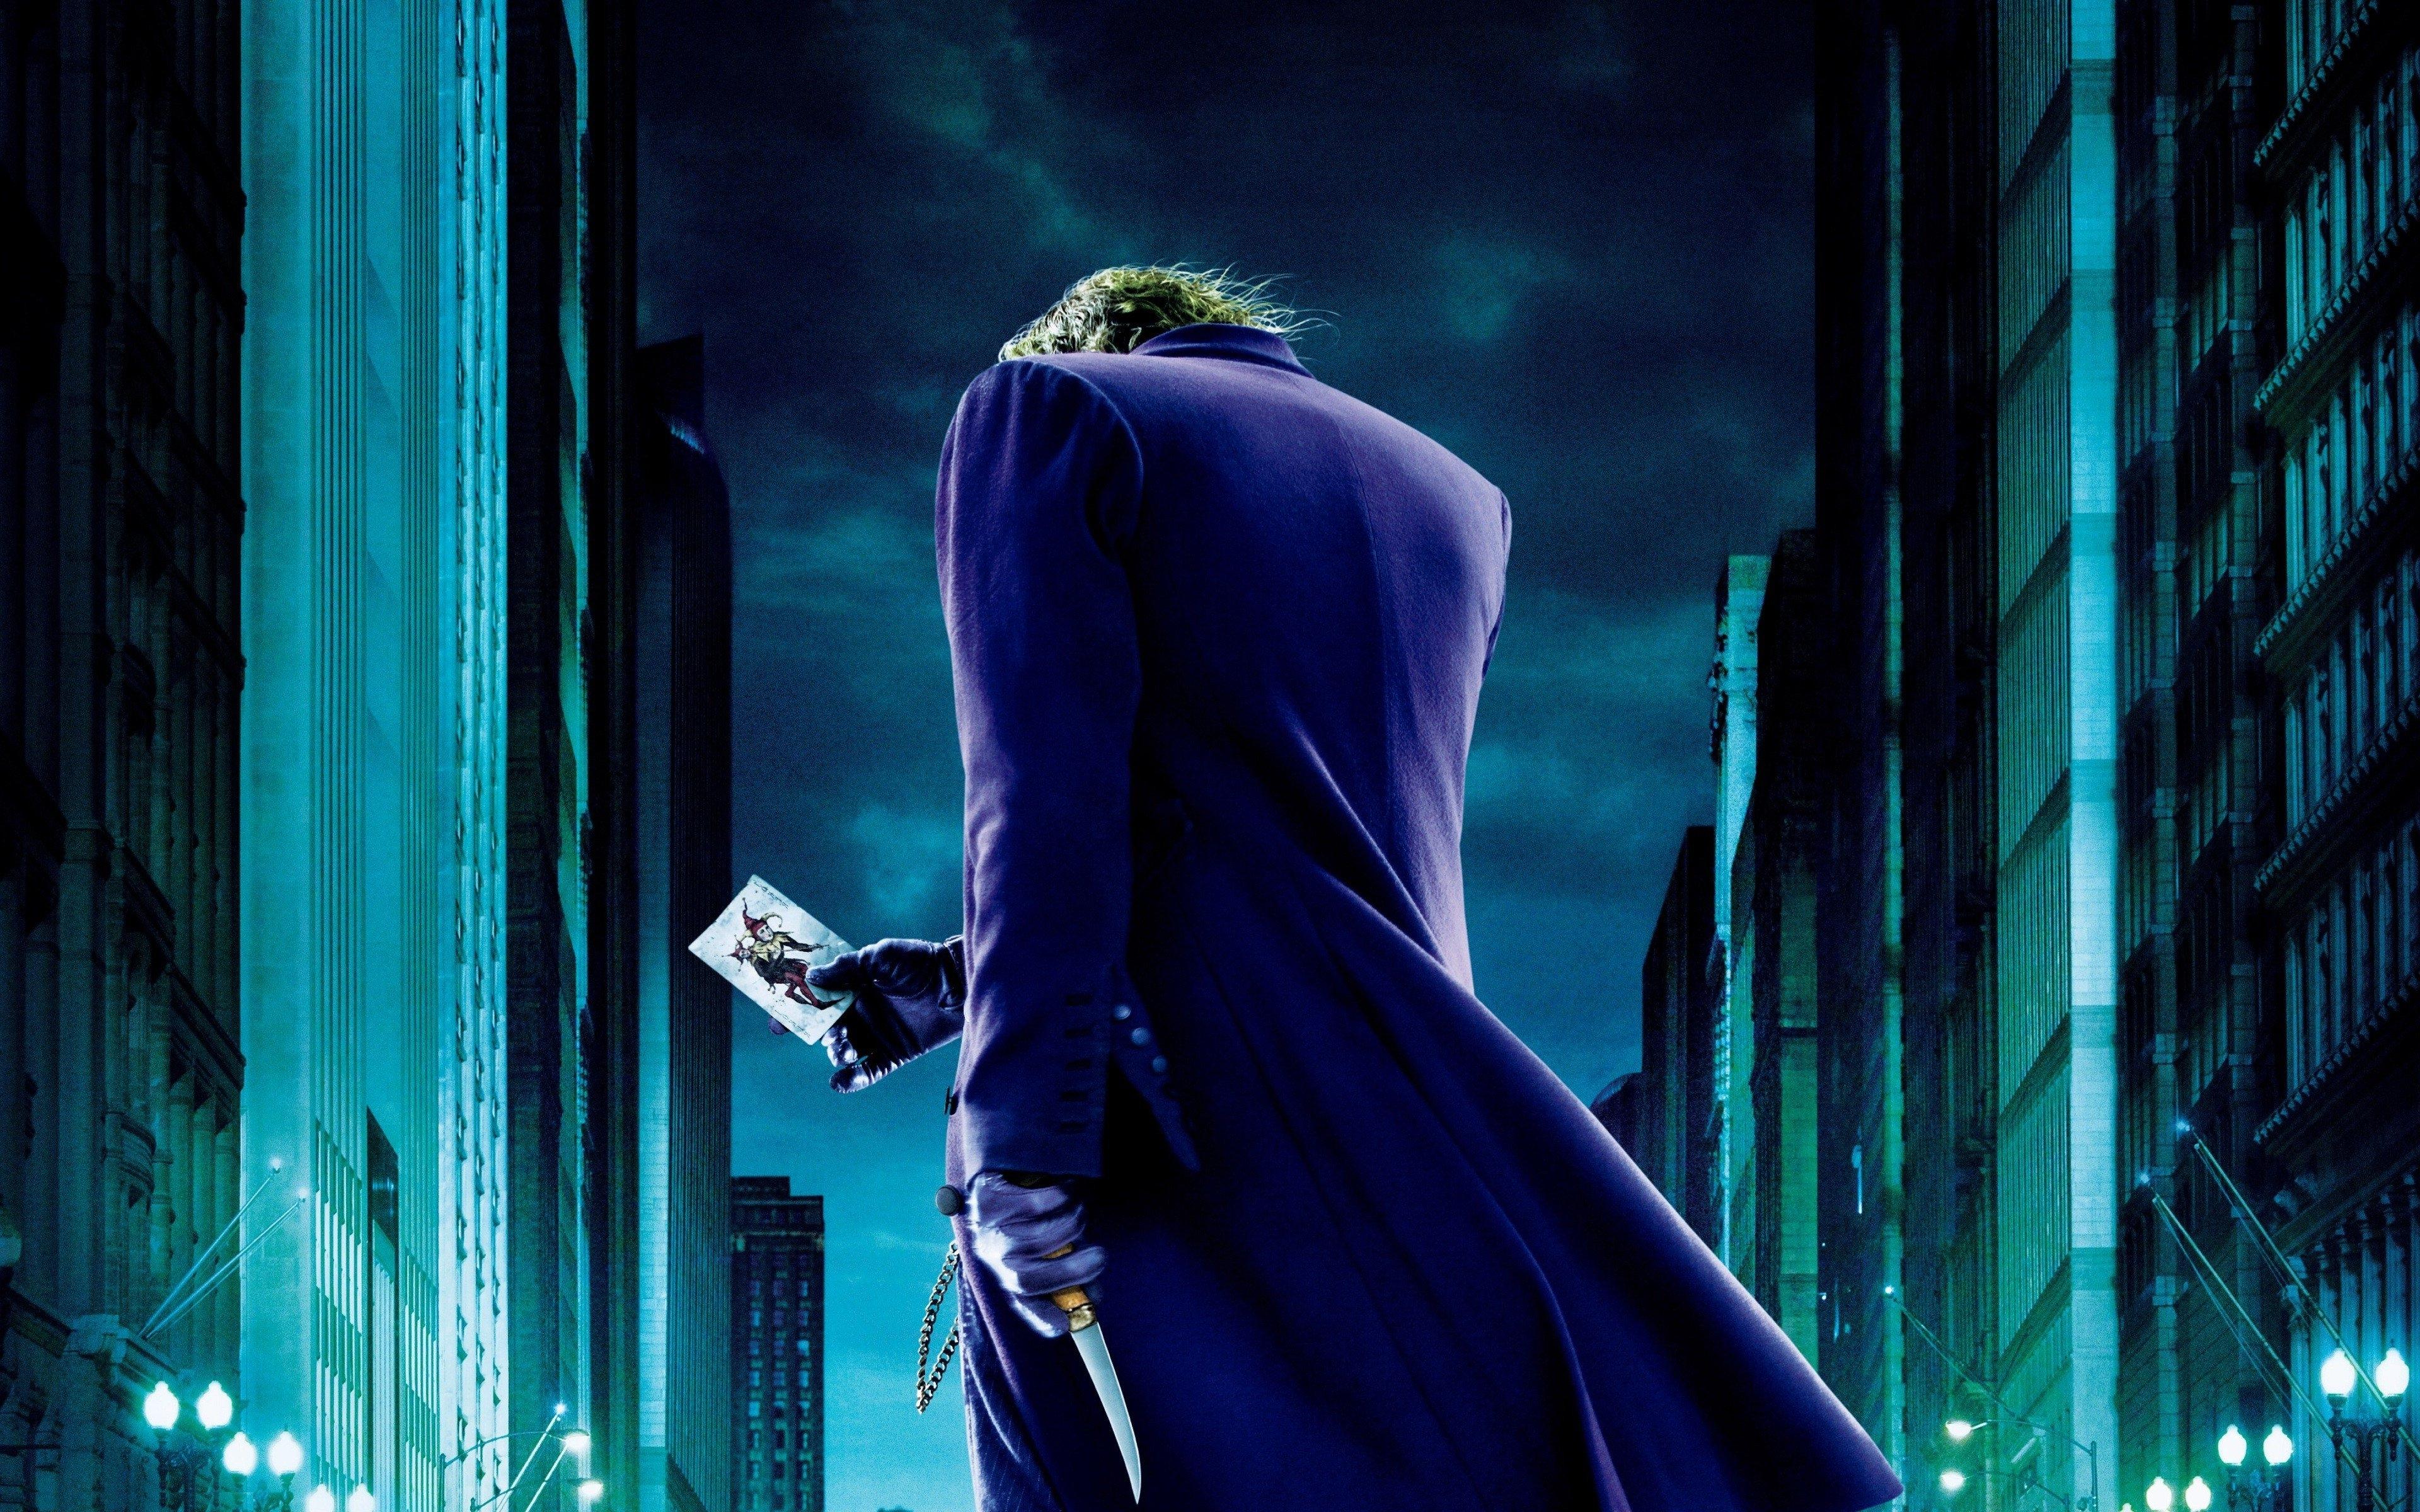 High Quality Images Of Joker 3840x2400 Wallpaper Teahub Io